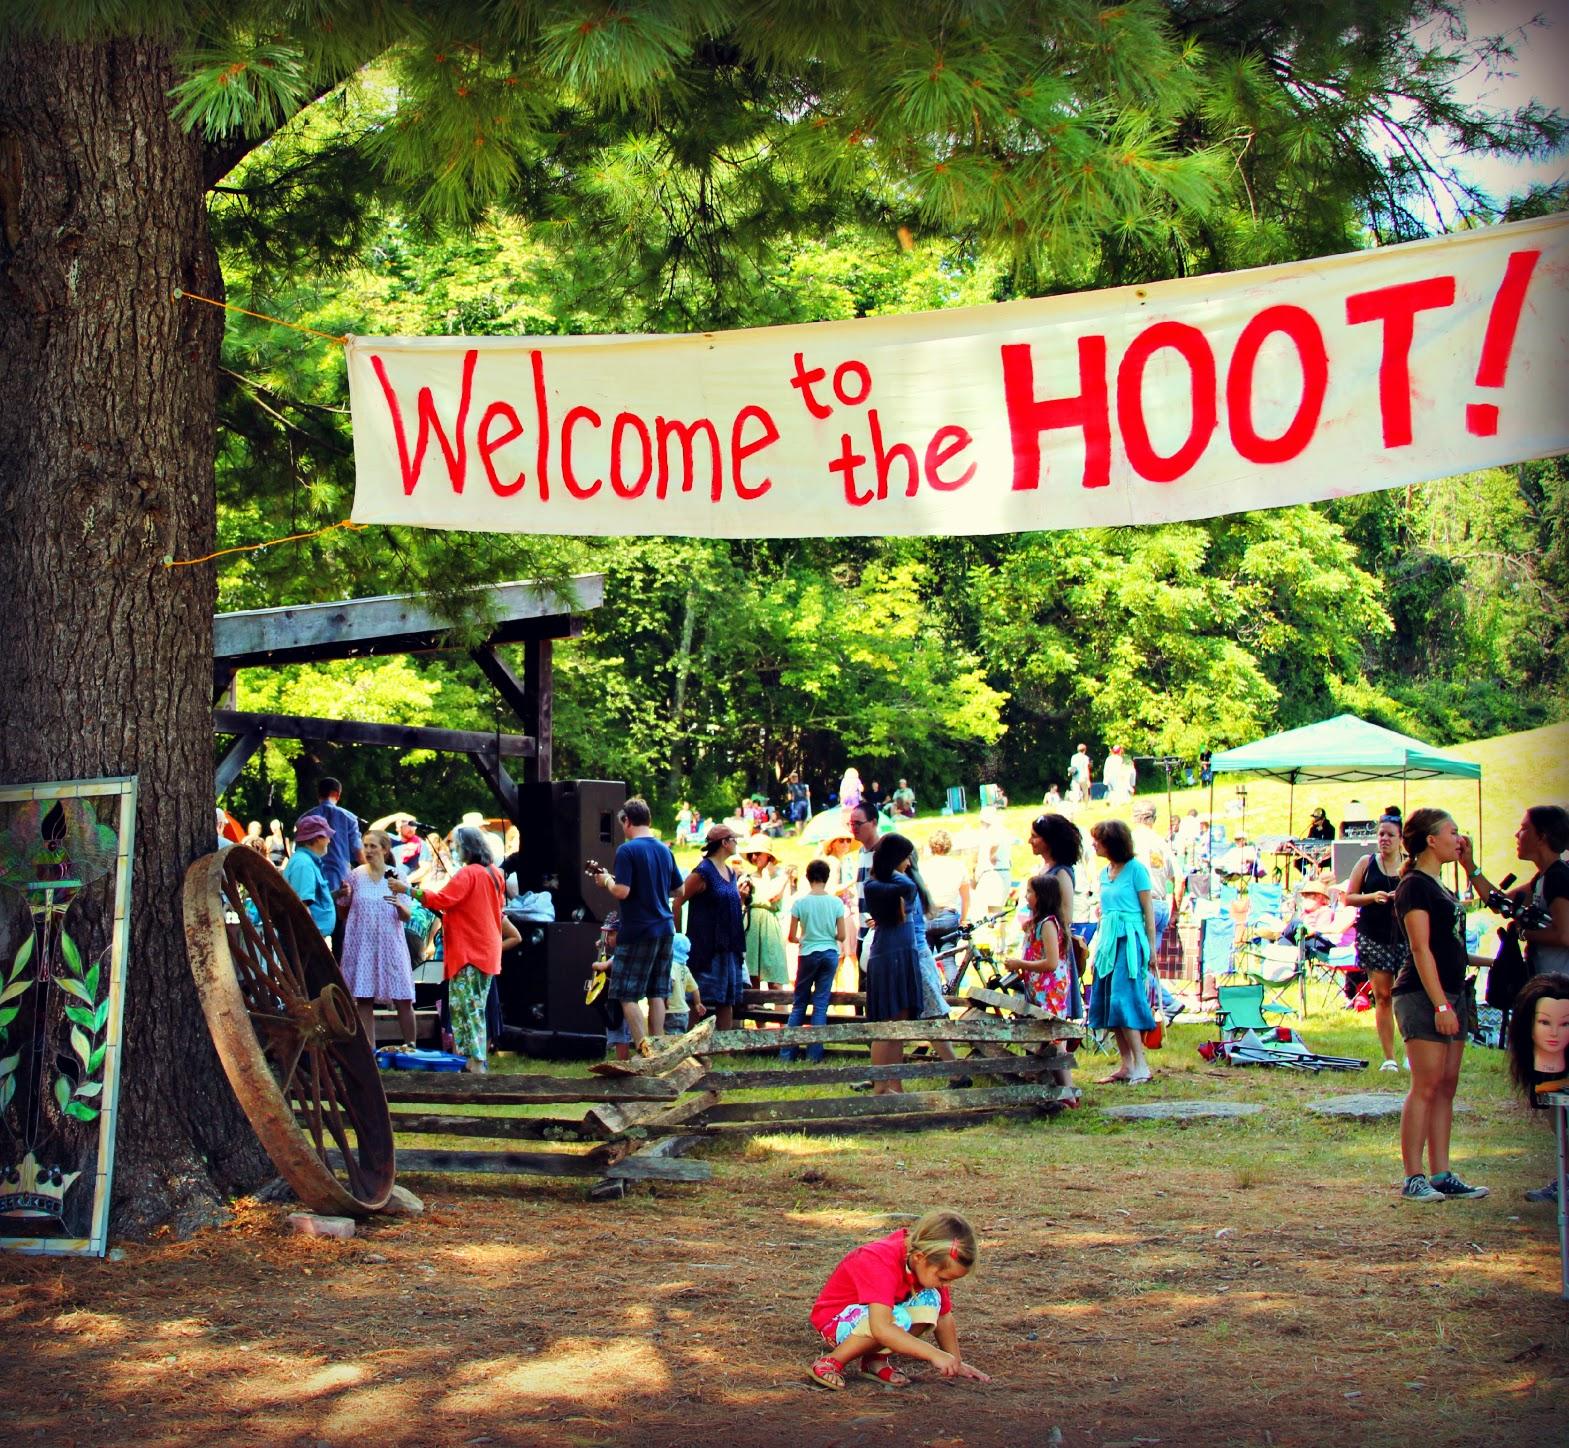 Summer Hoot